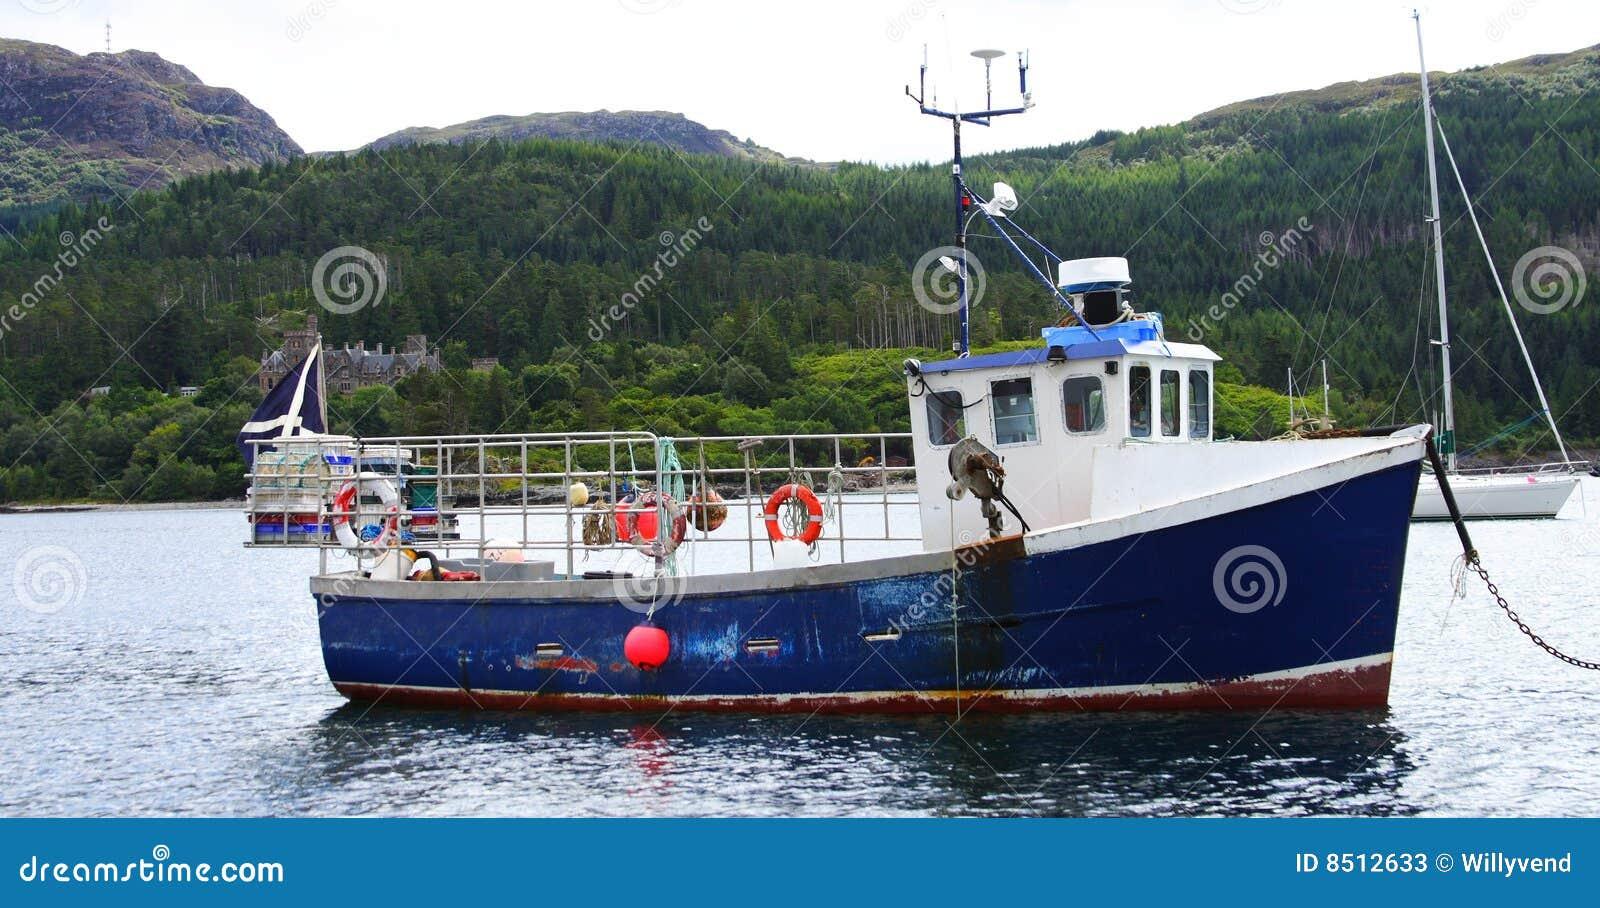 Old fishing boat in the bay of plockton upon loch carron, Scotland.